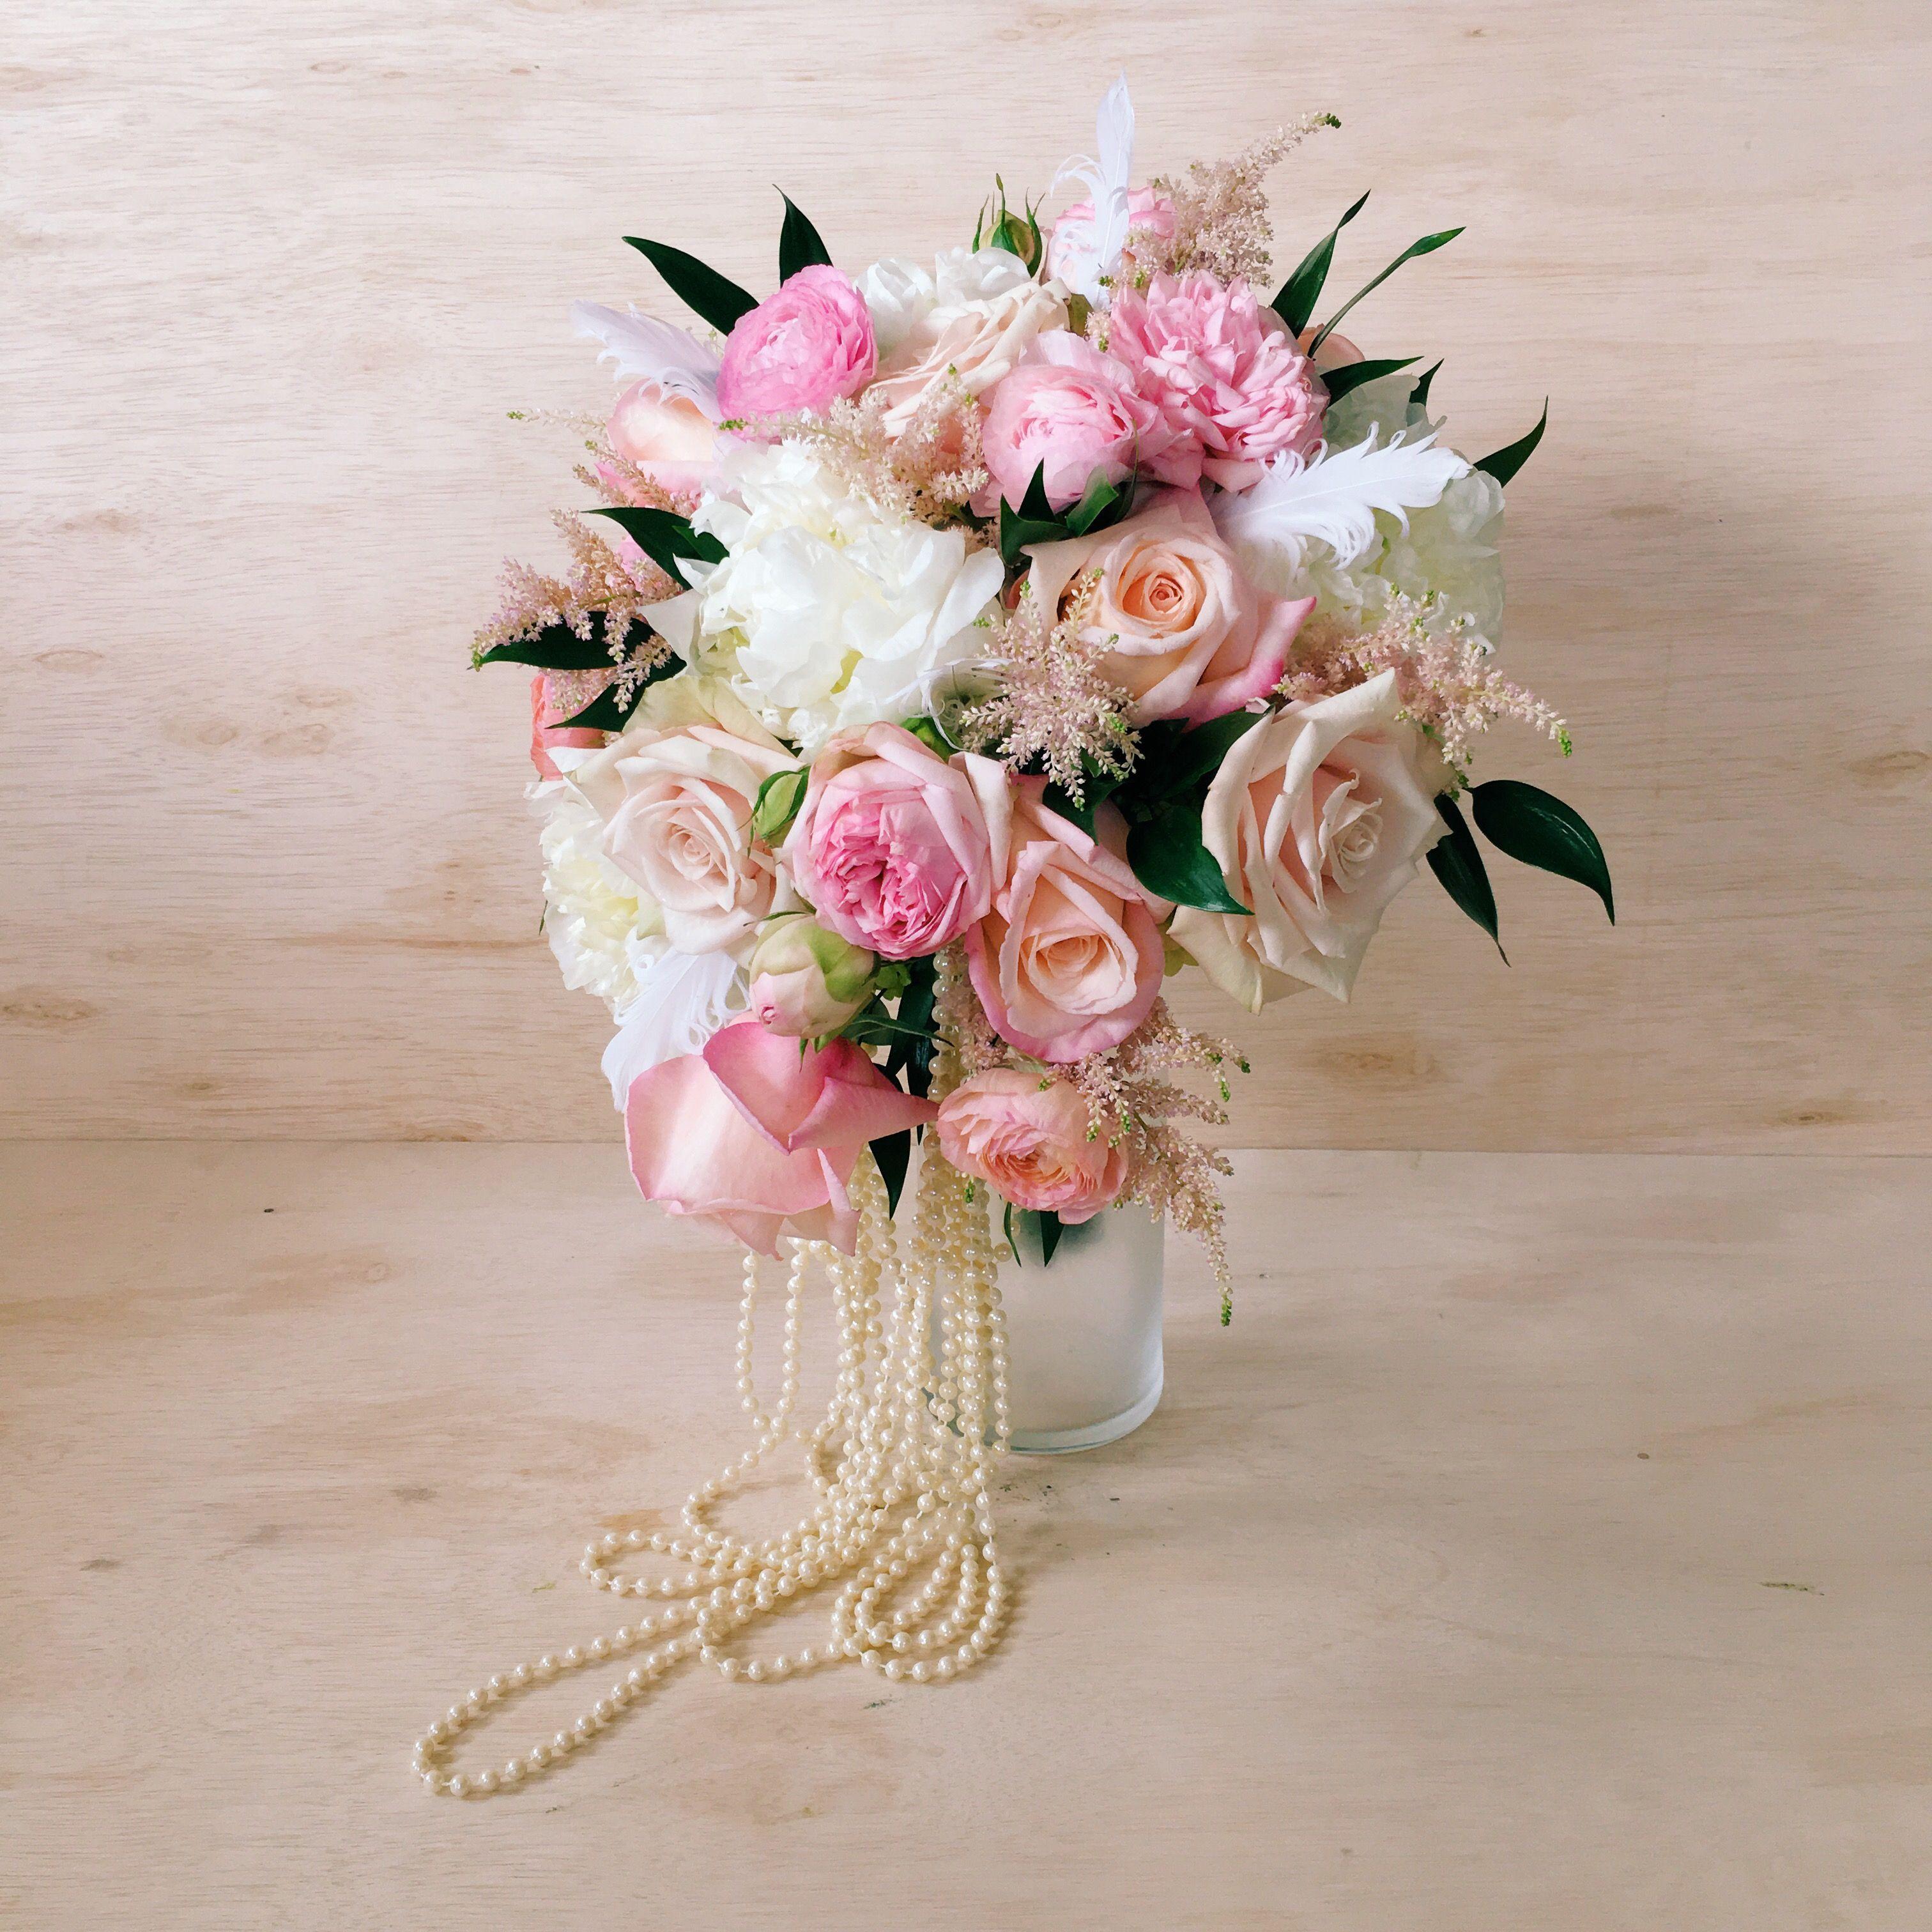 flowerskistner's flowers | portfolio: bridal bouquets